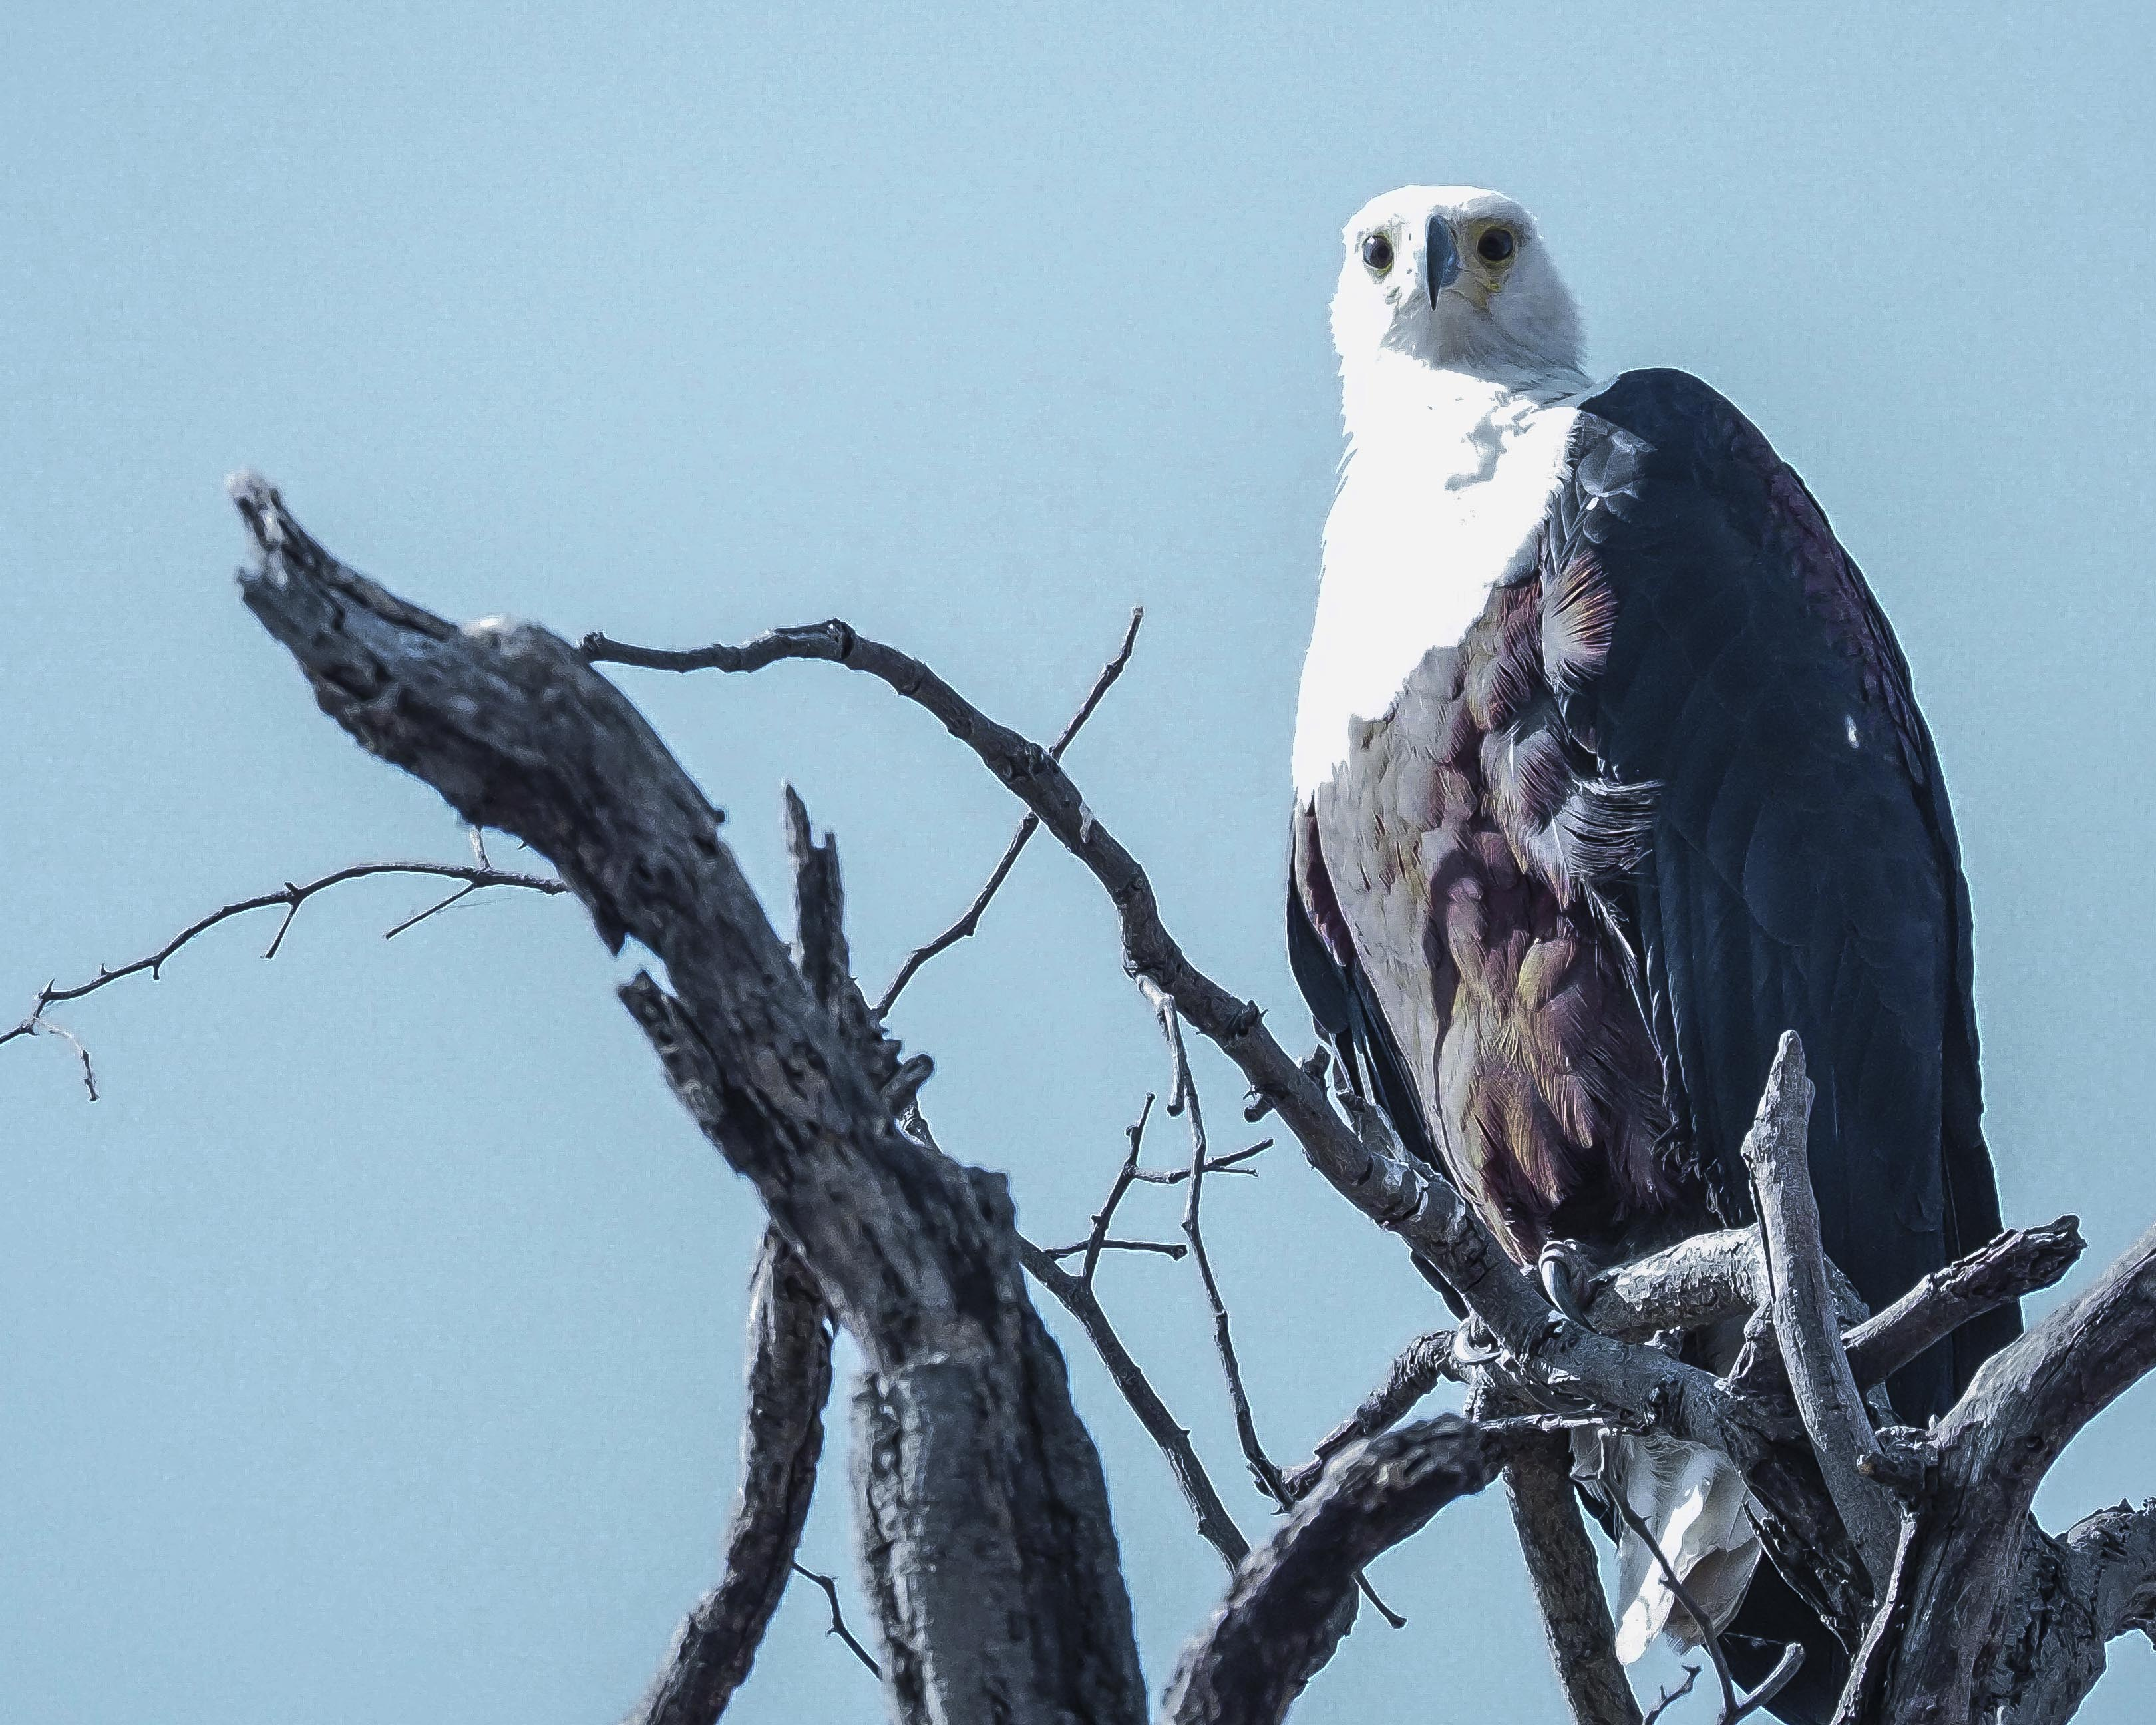 Blue crested eagle